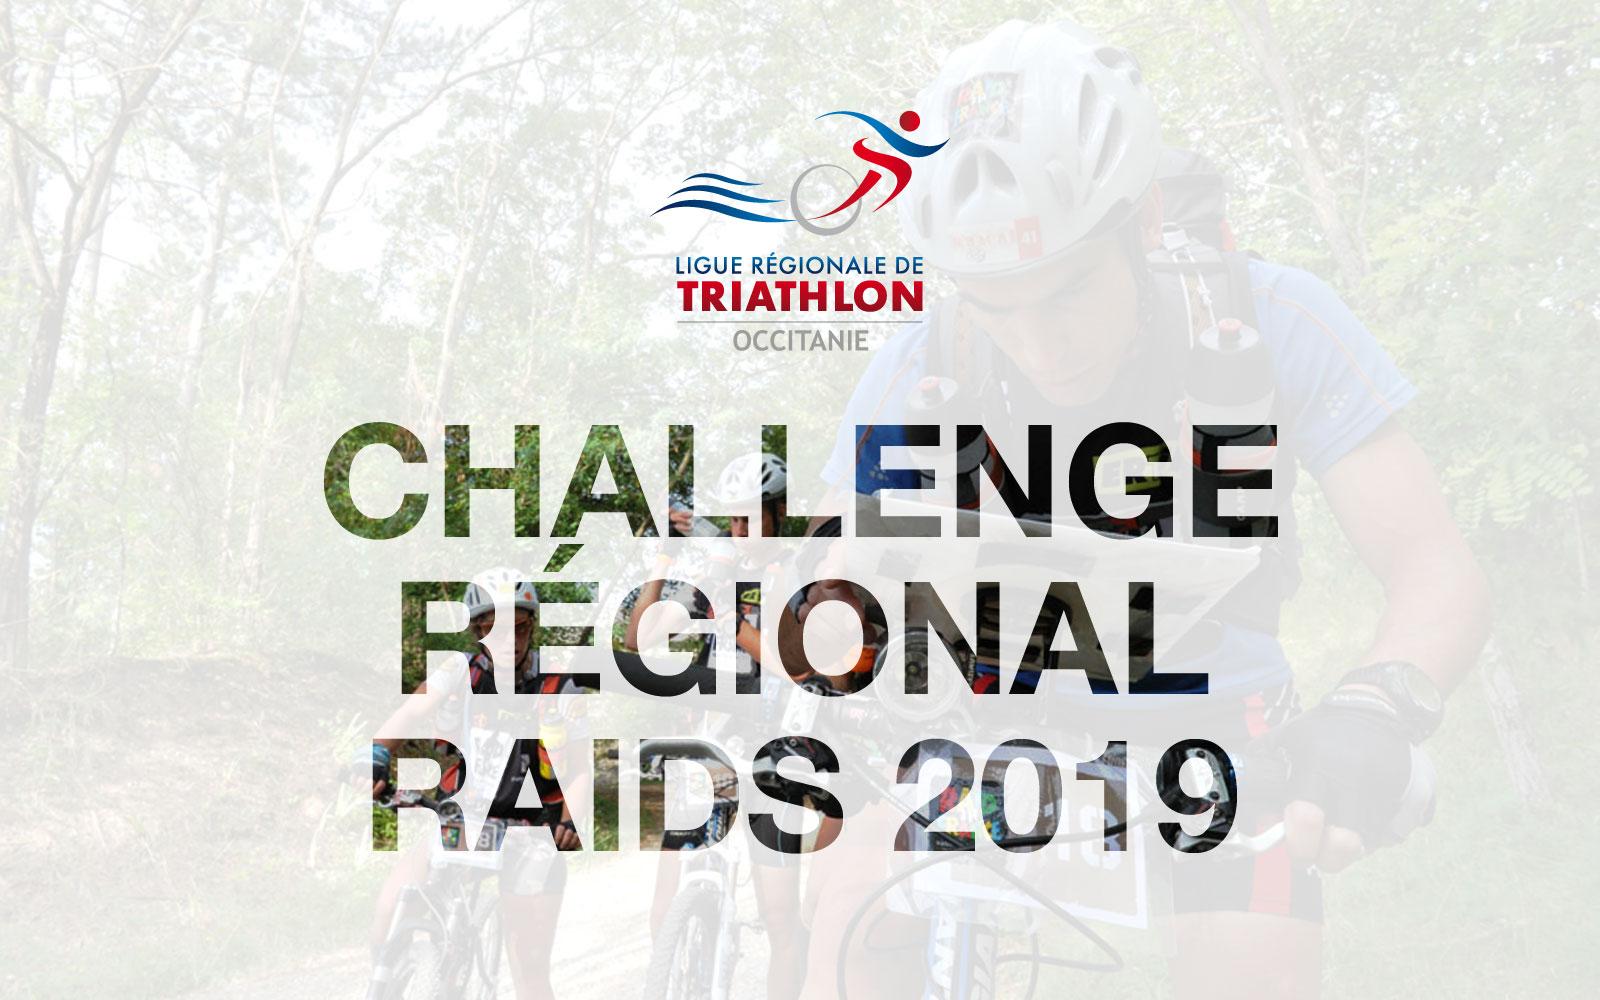 Calendrier Raid Multisport 2019.Challenge Regional Raids Ligue Regionale De Triathlon